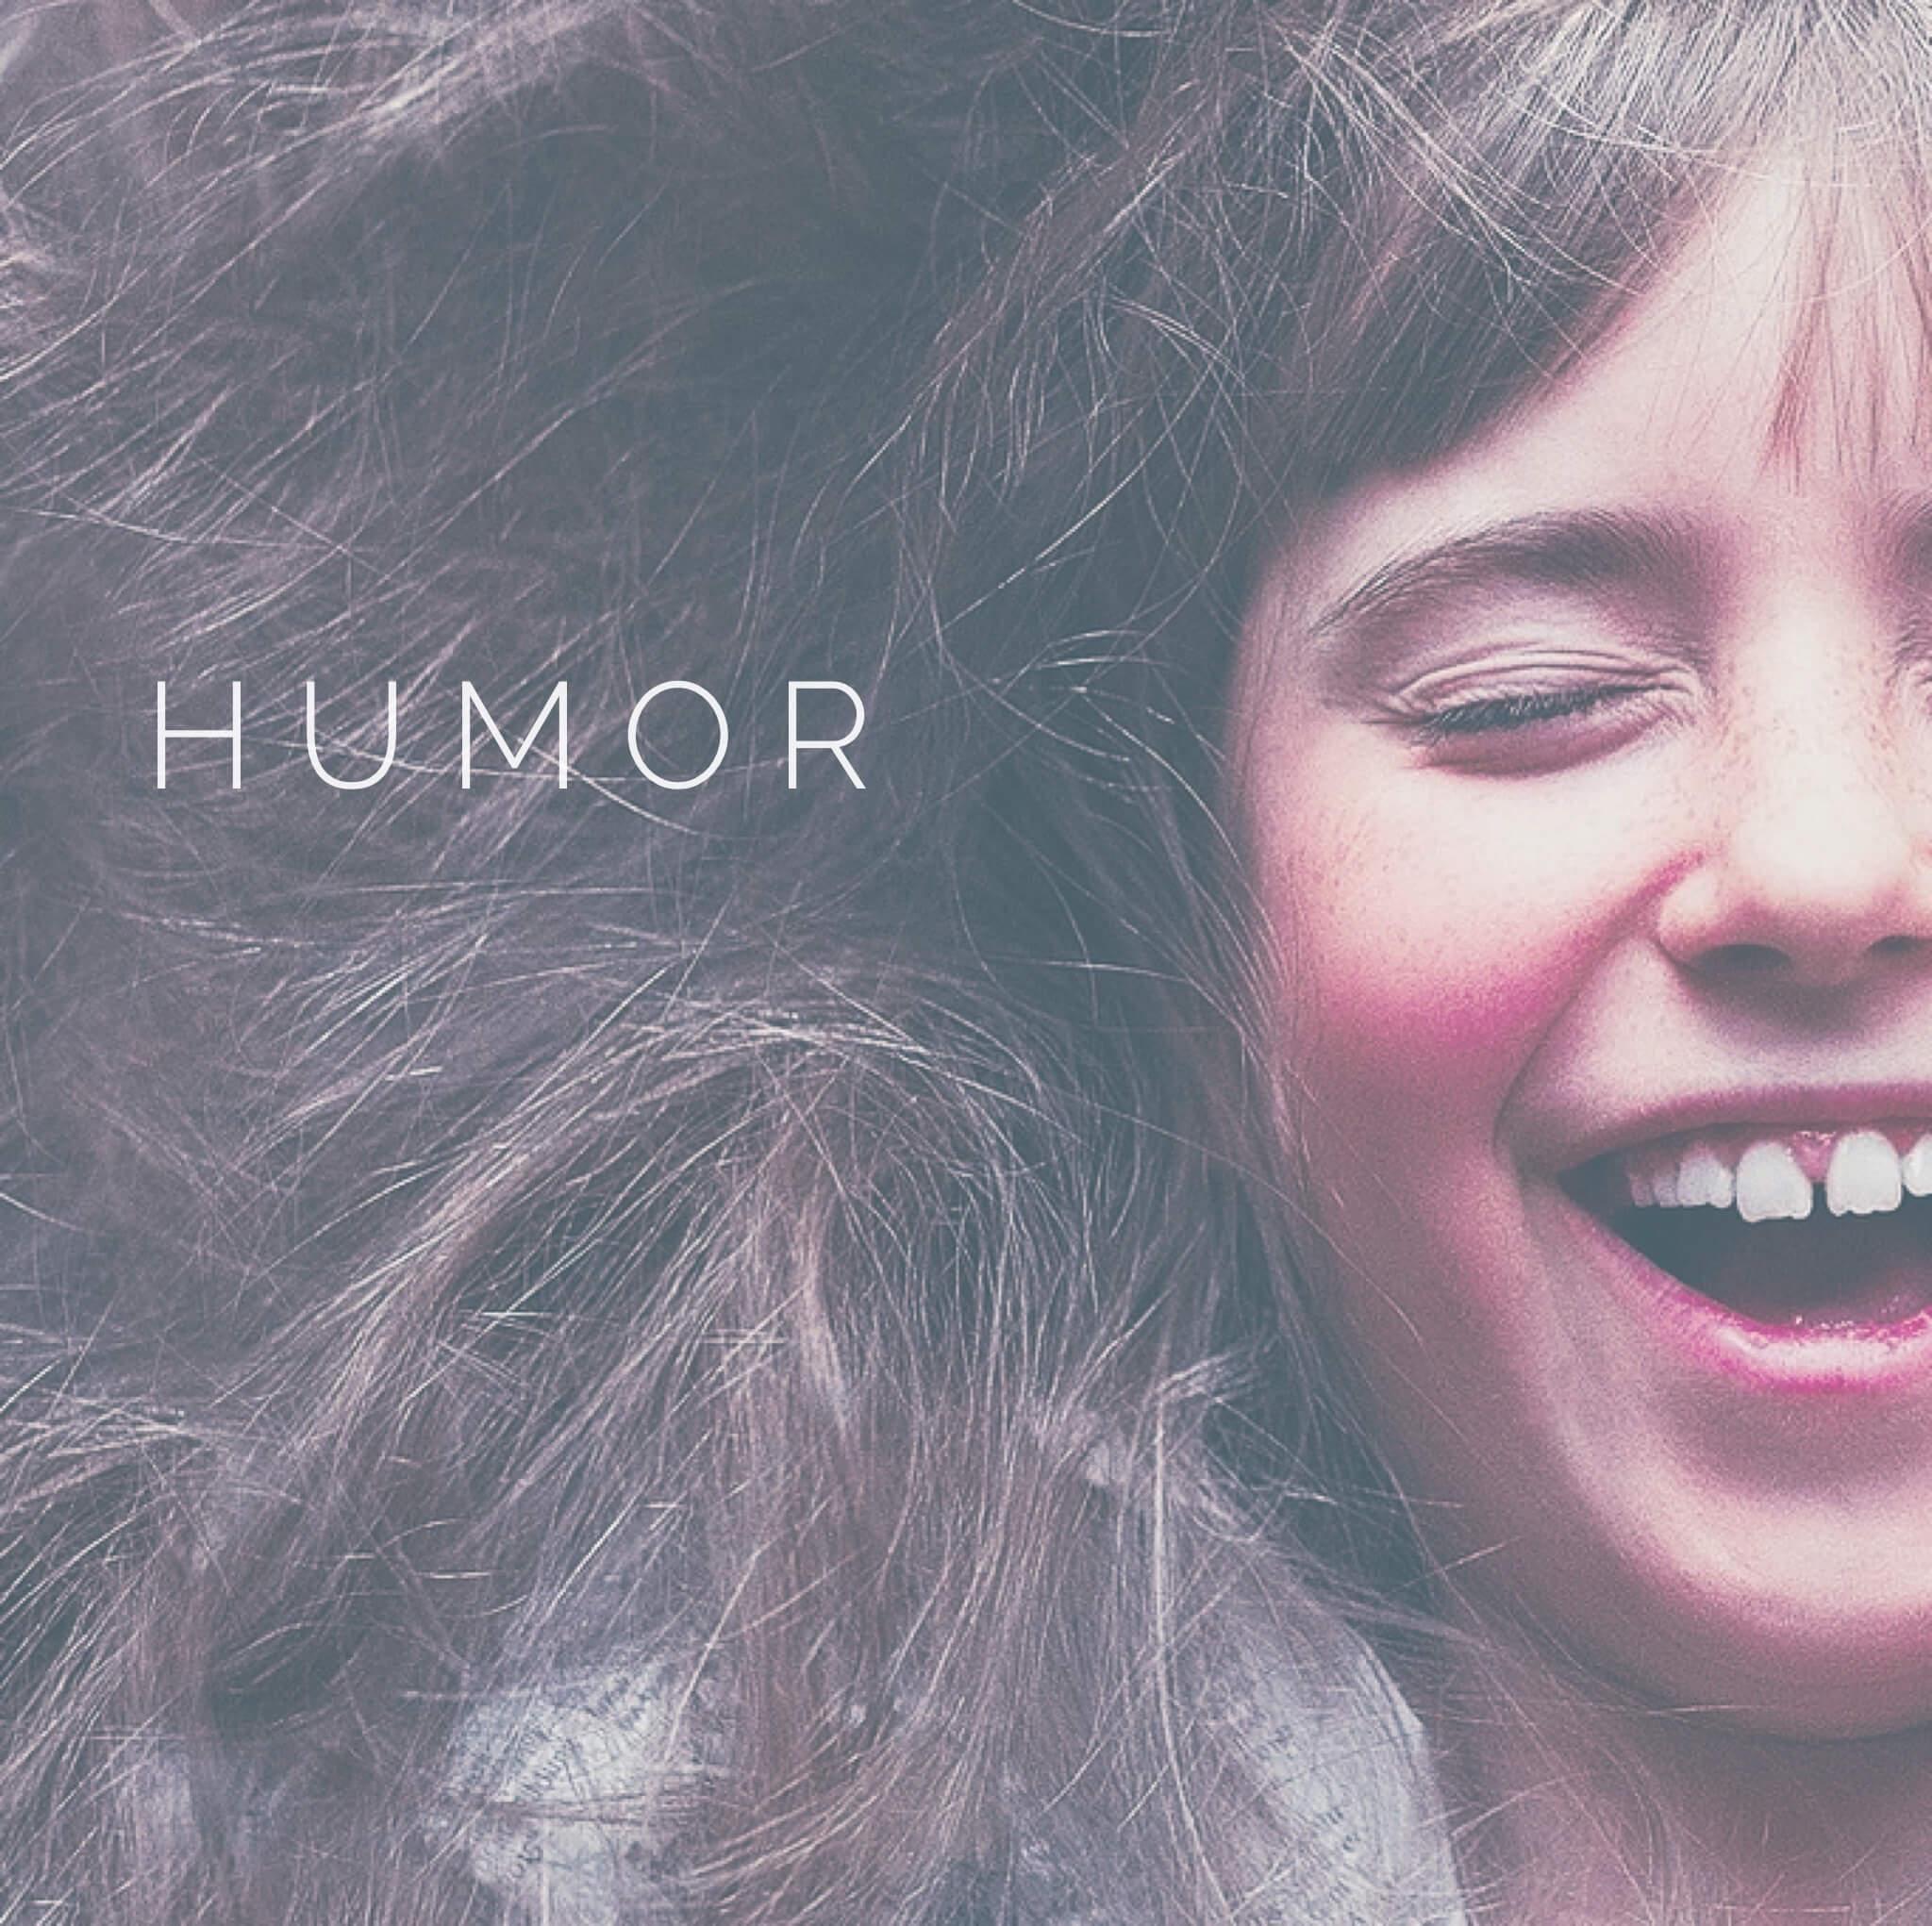 Humor | Strength | Signature Transcendence